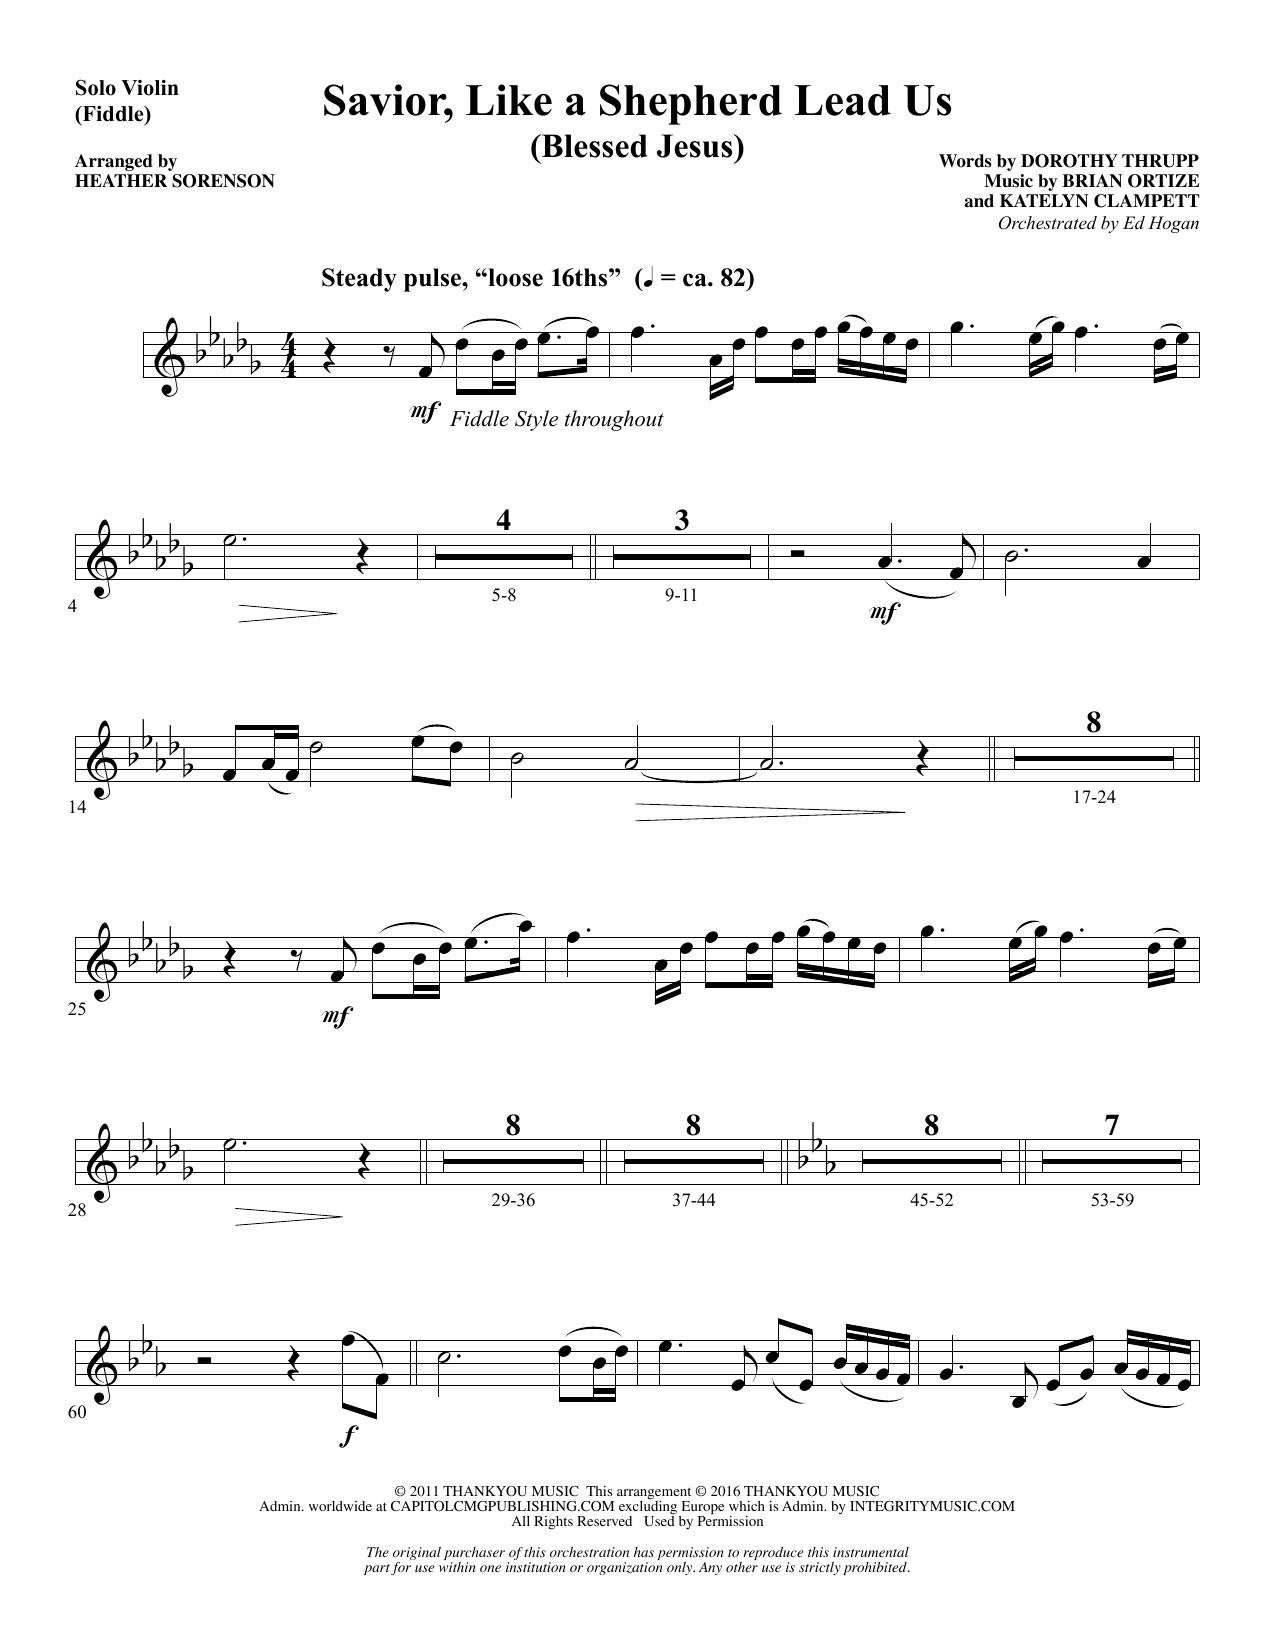 Savior, Like a Shepherd Lead Us (Blessed Jesus) - Fiddle/Violin Sheet Music